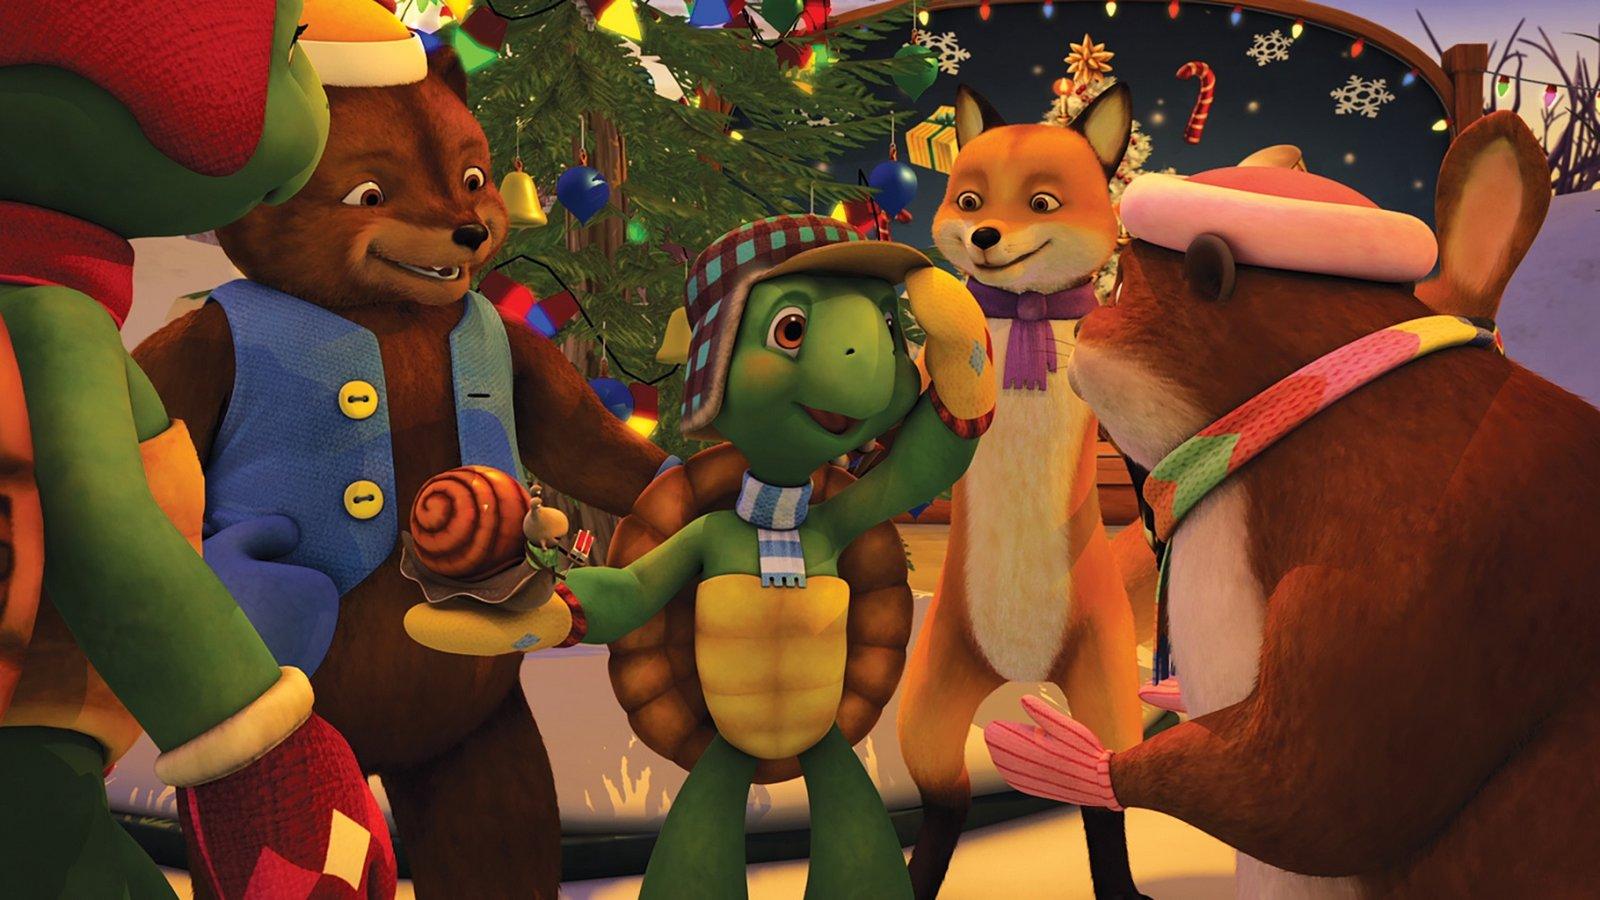 Franklin's Christmas Spirit / Franklin's Campout